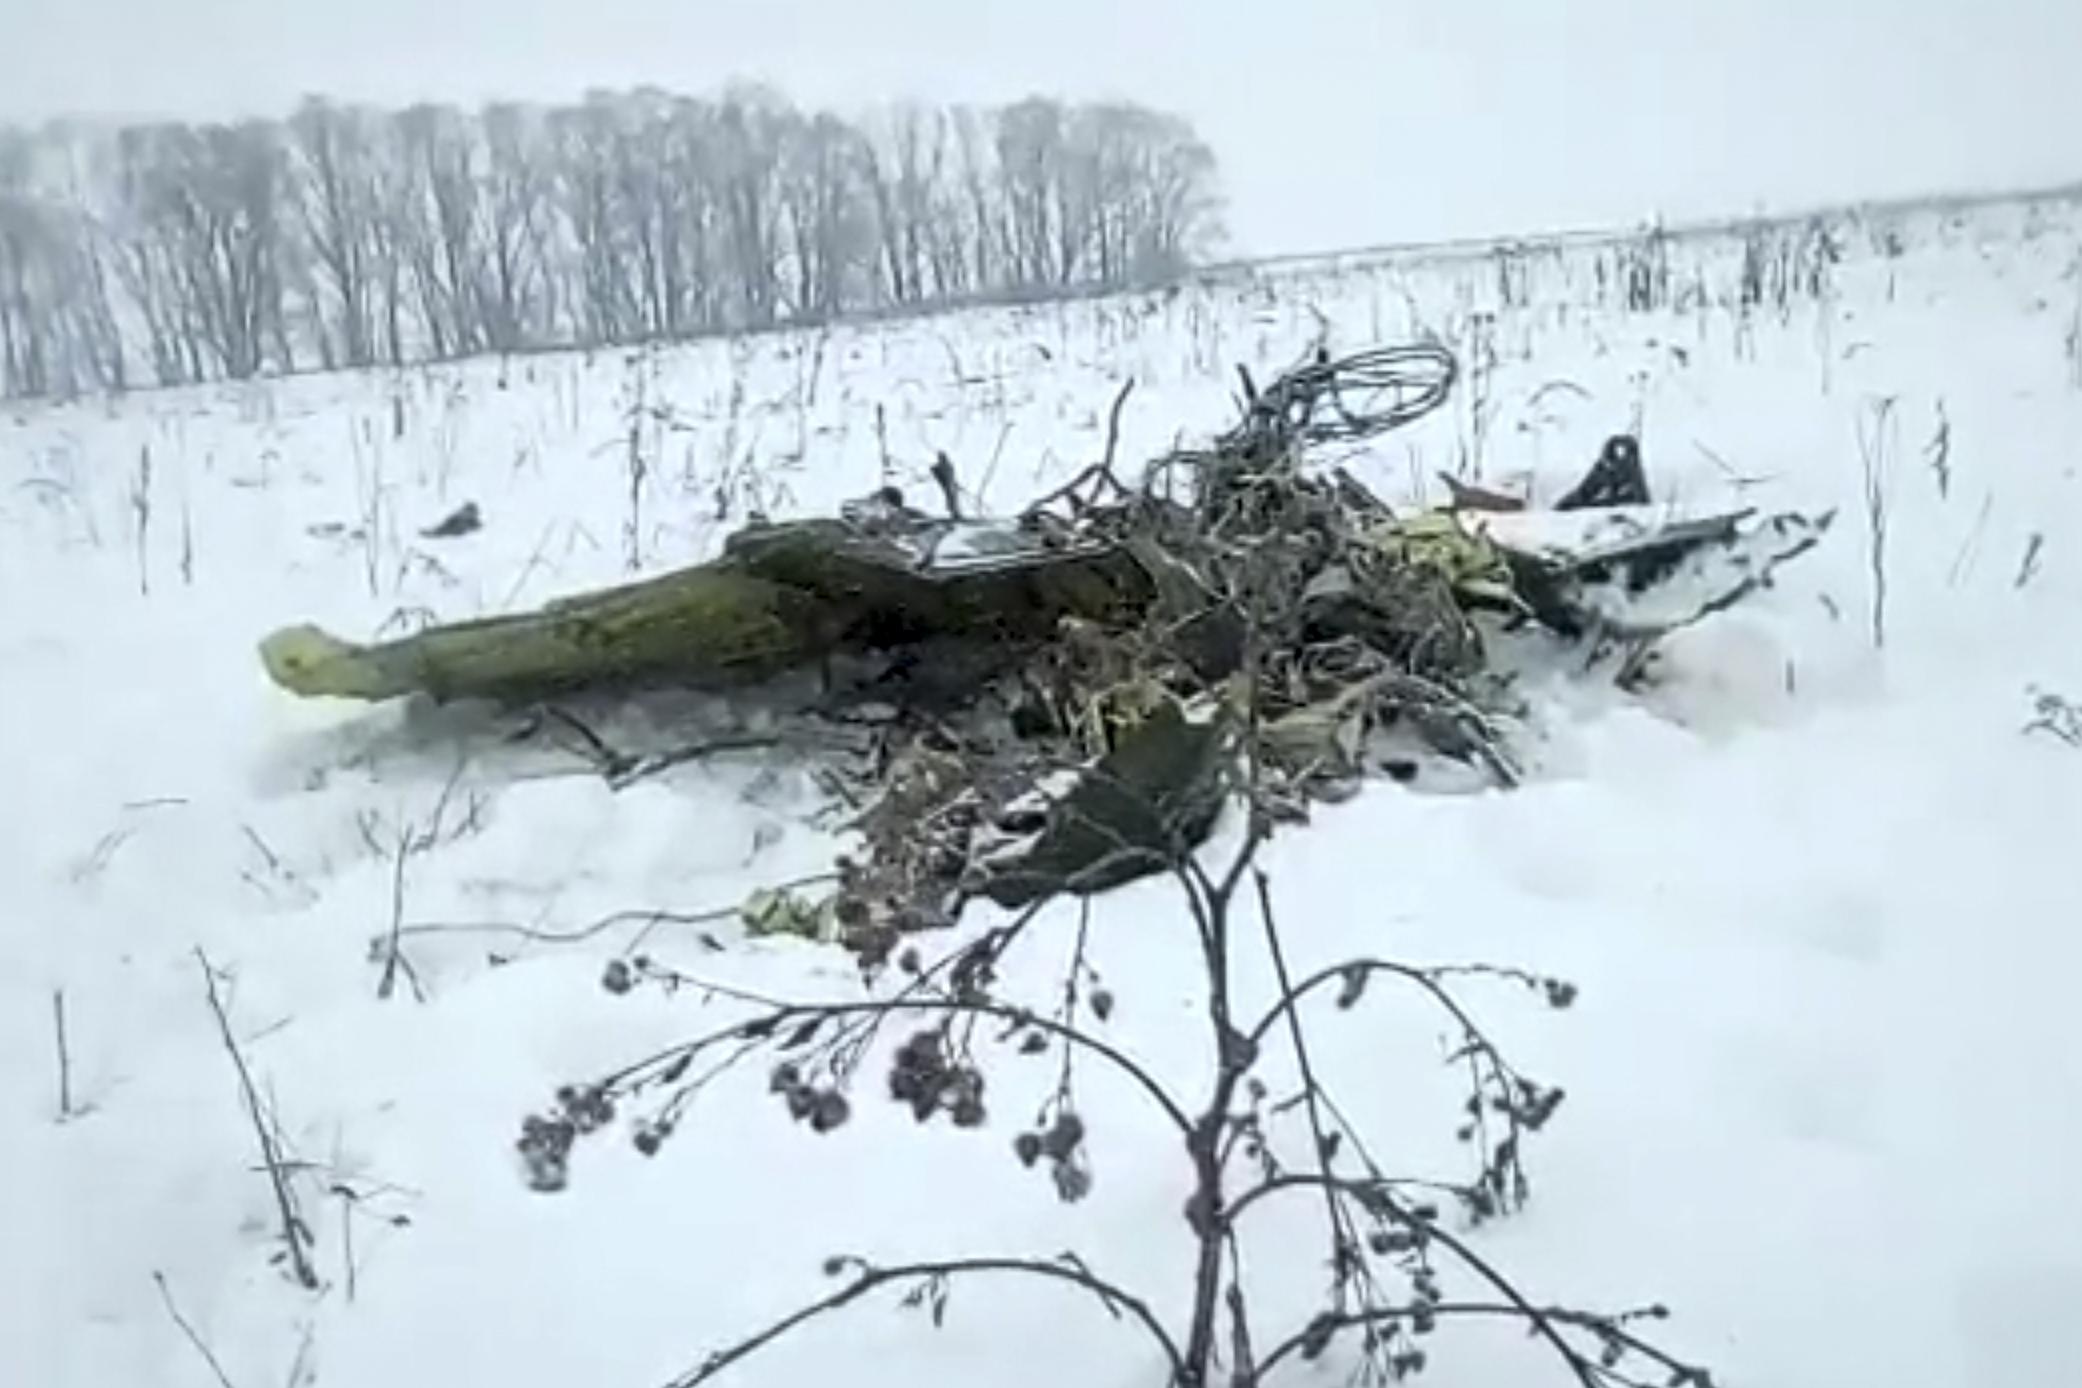 Un avión ruso de tipo Antonov An-148 cae cerca de Moscú